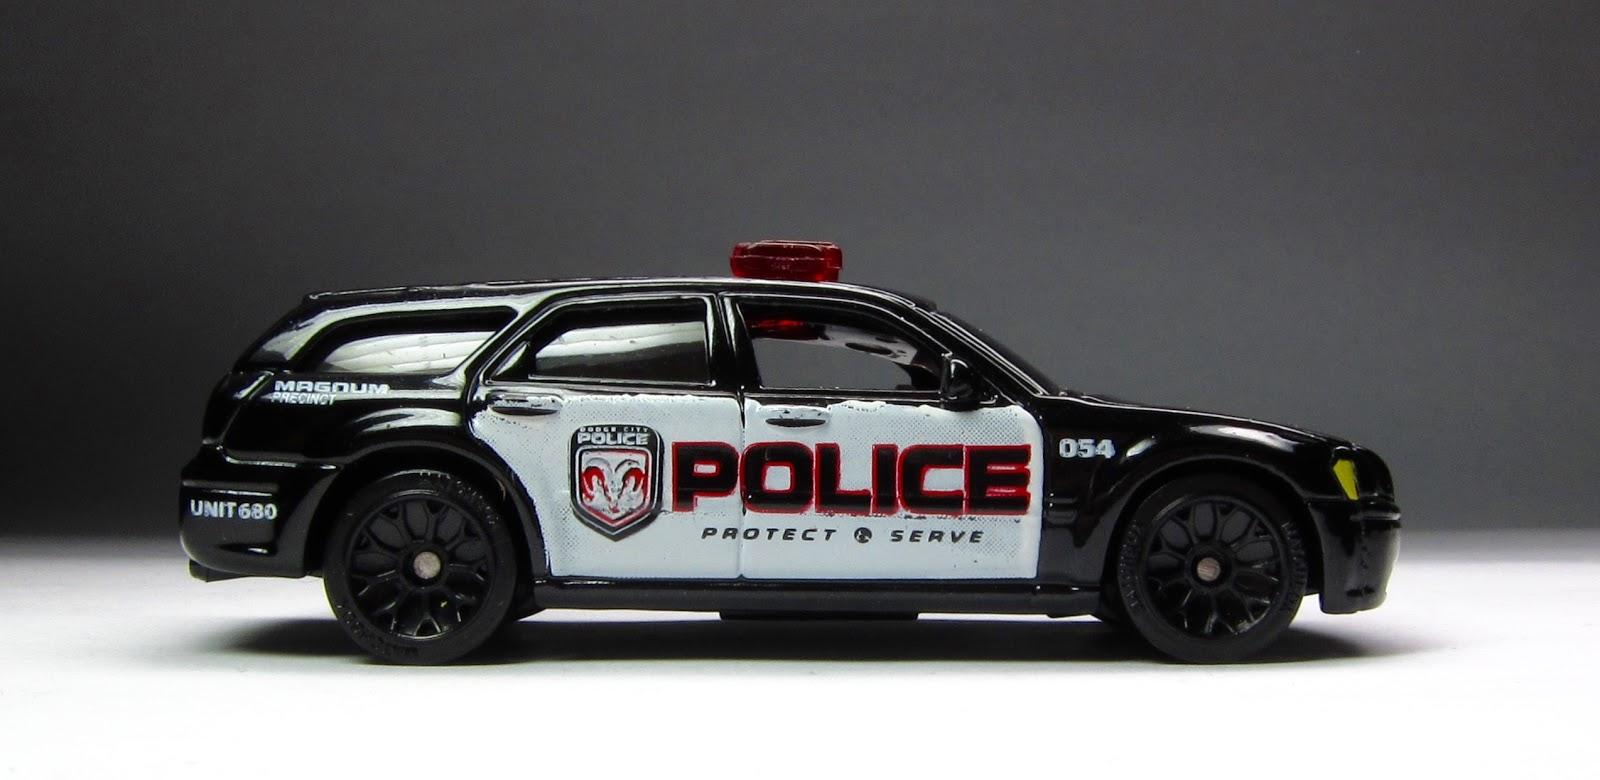 The Last Golden Age Of Matchbox Black Amp White Police Cars